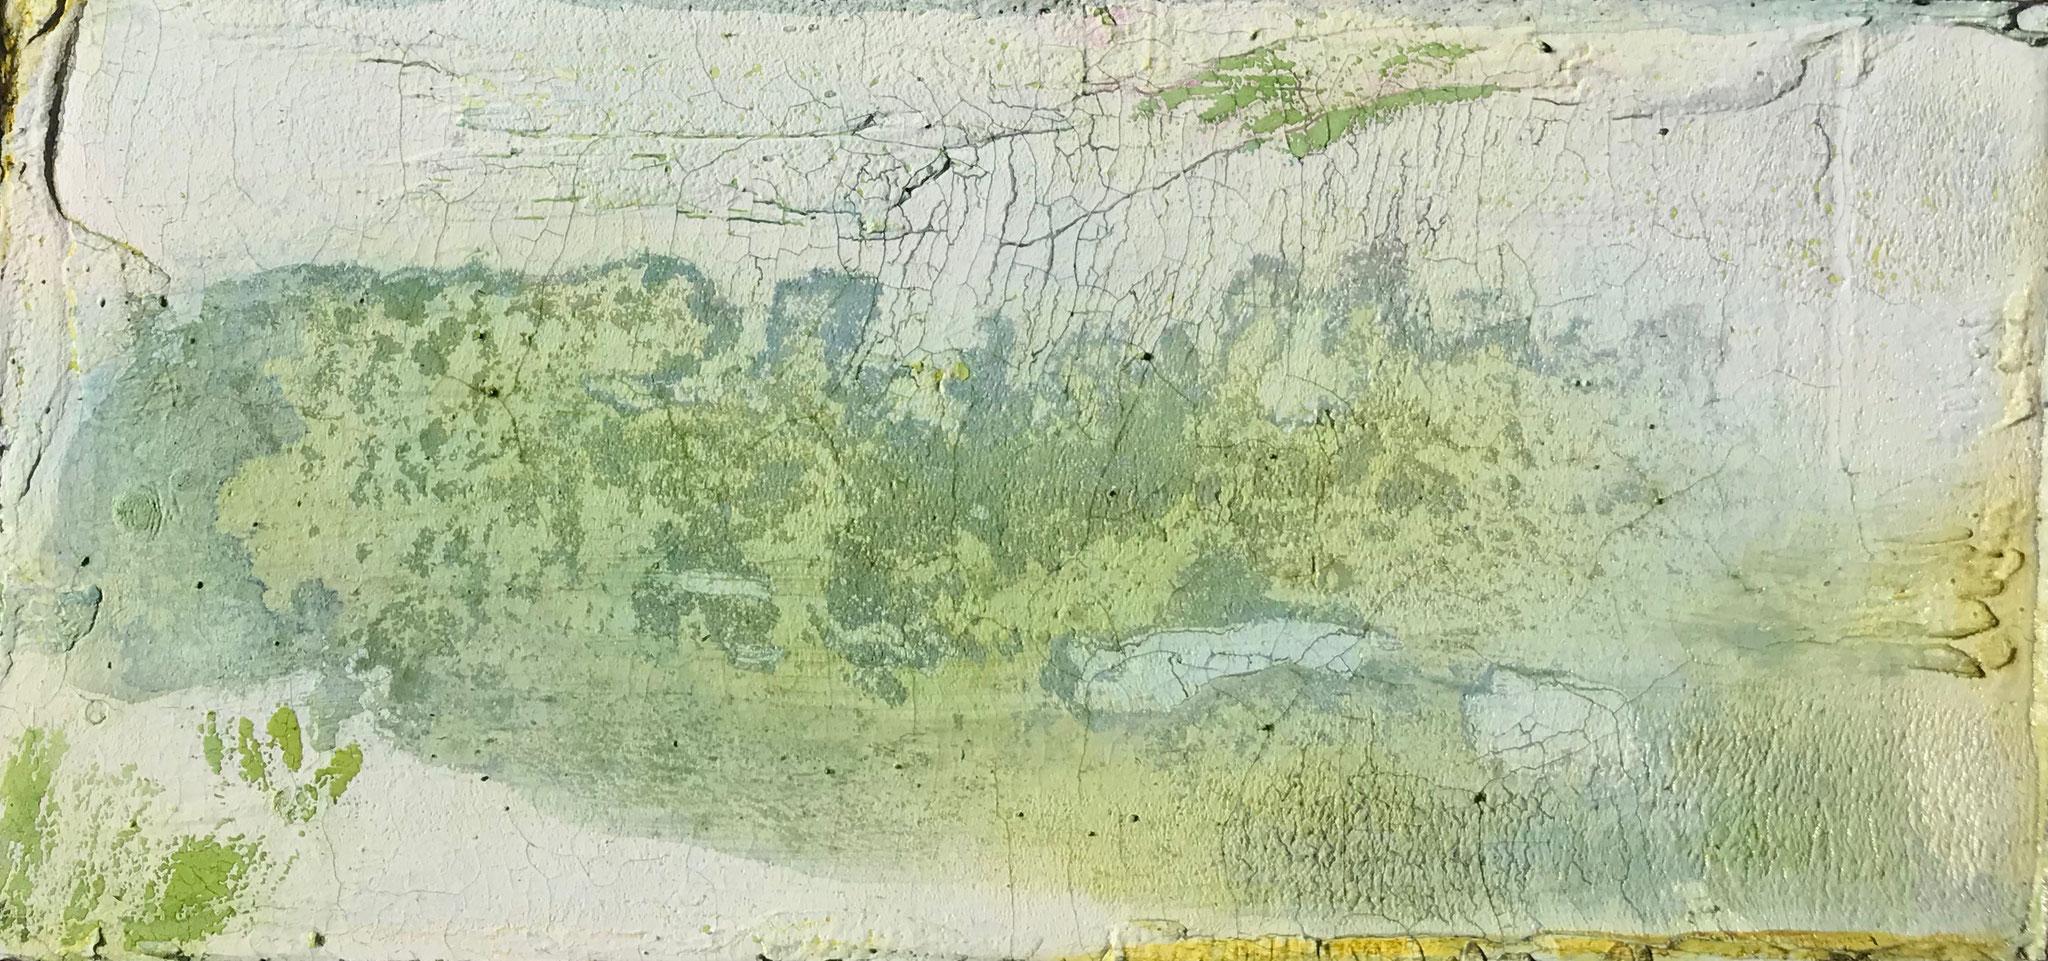 #14 Holzkiste - rechteckig - ca. 24 x 11 x 7 cm (L/B/H)